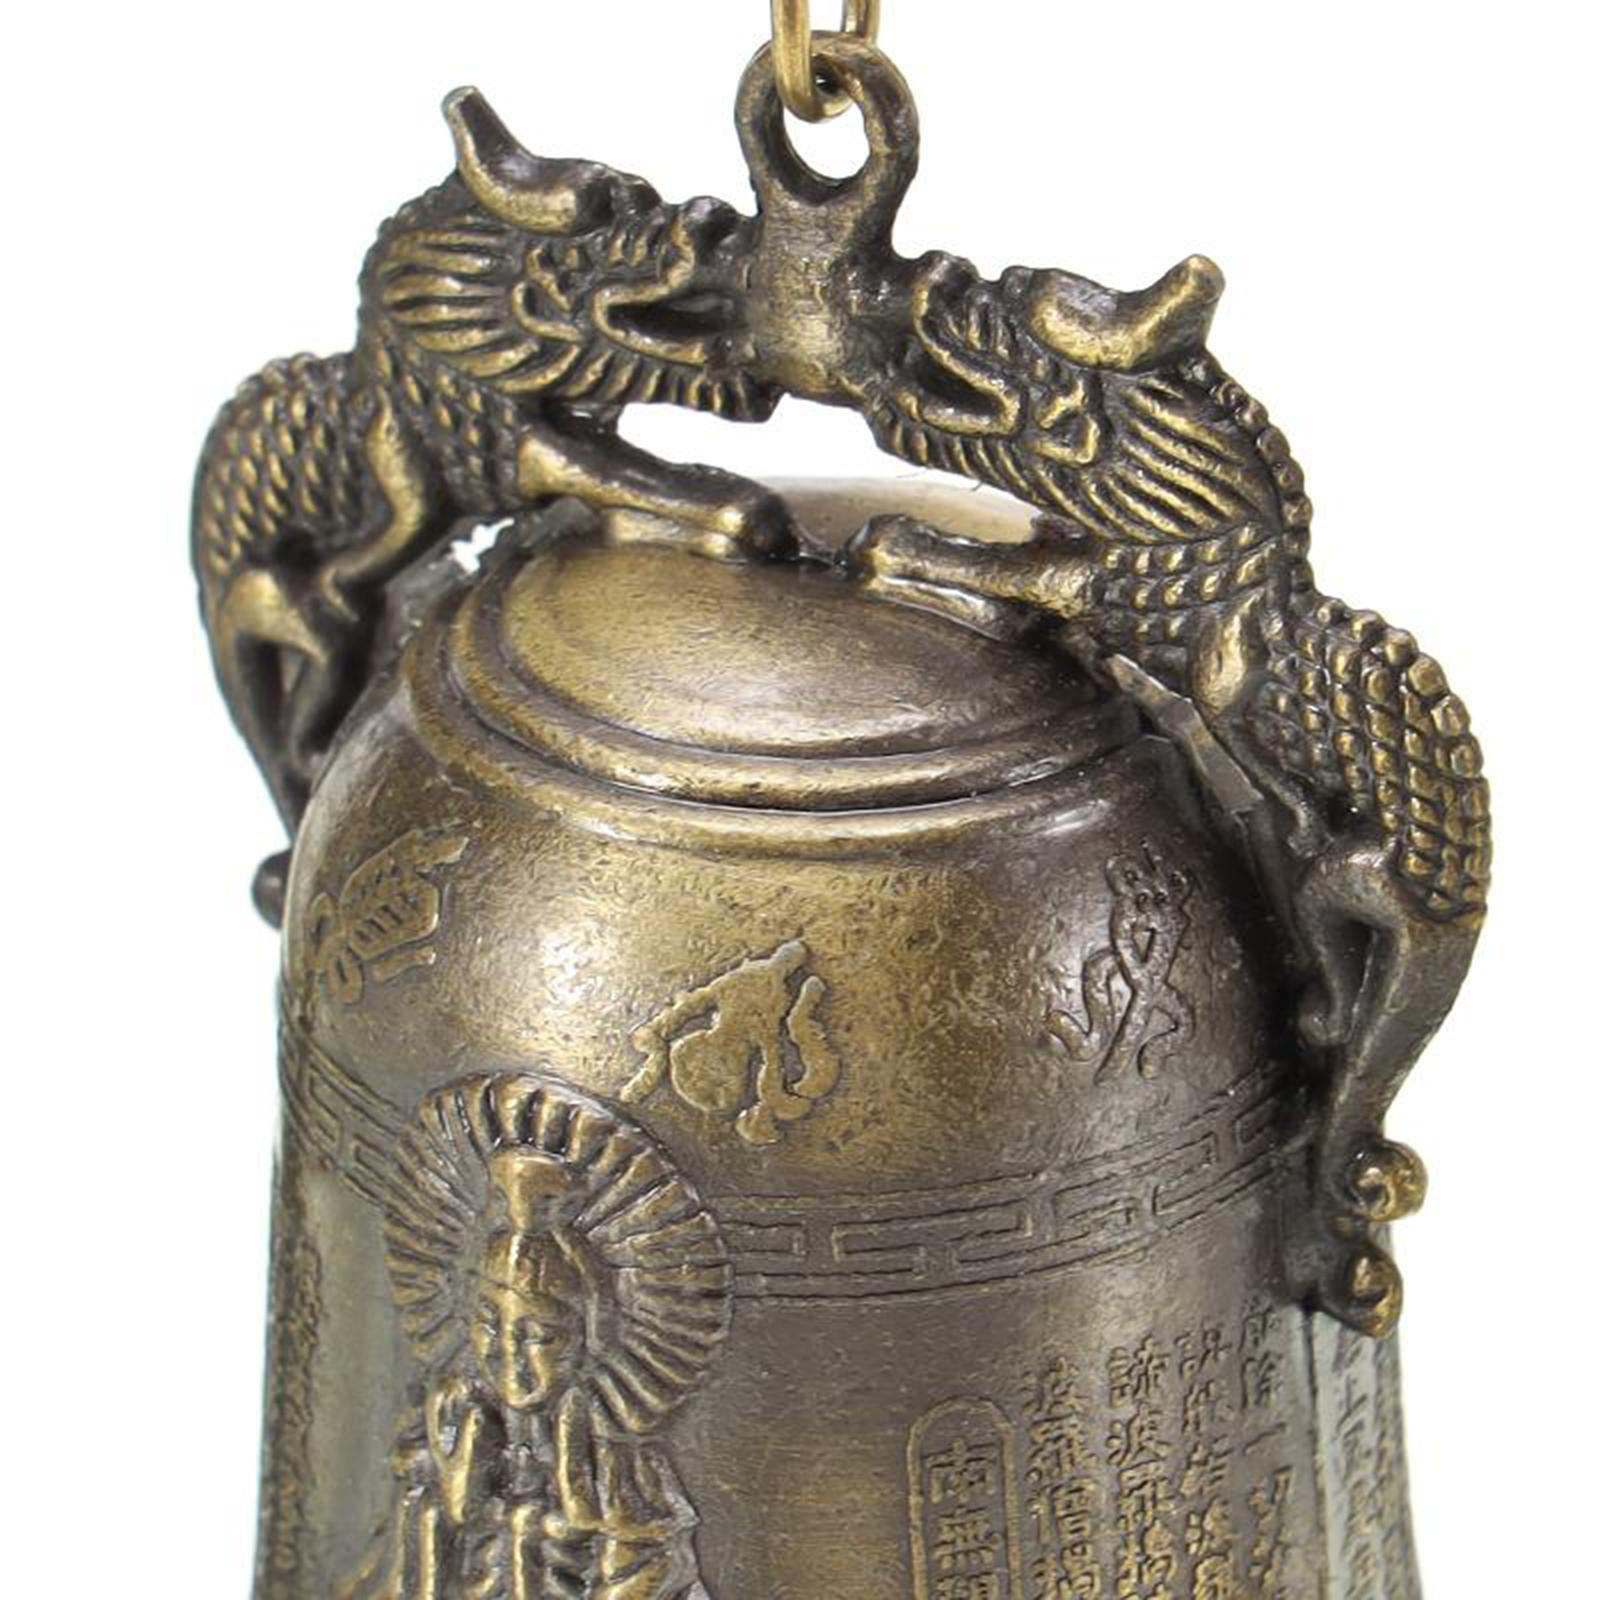 miniatura 11 - Buddha Drago Fengshui campana giocattoli tibetano per Home GIARDINO